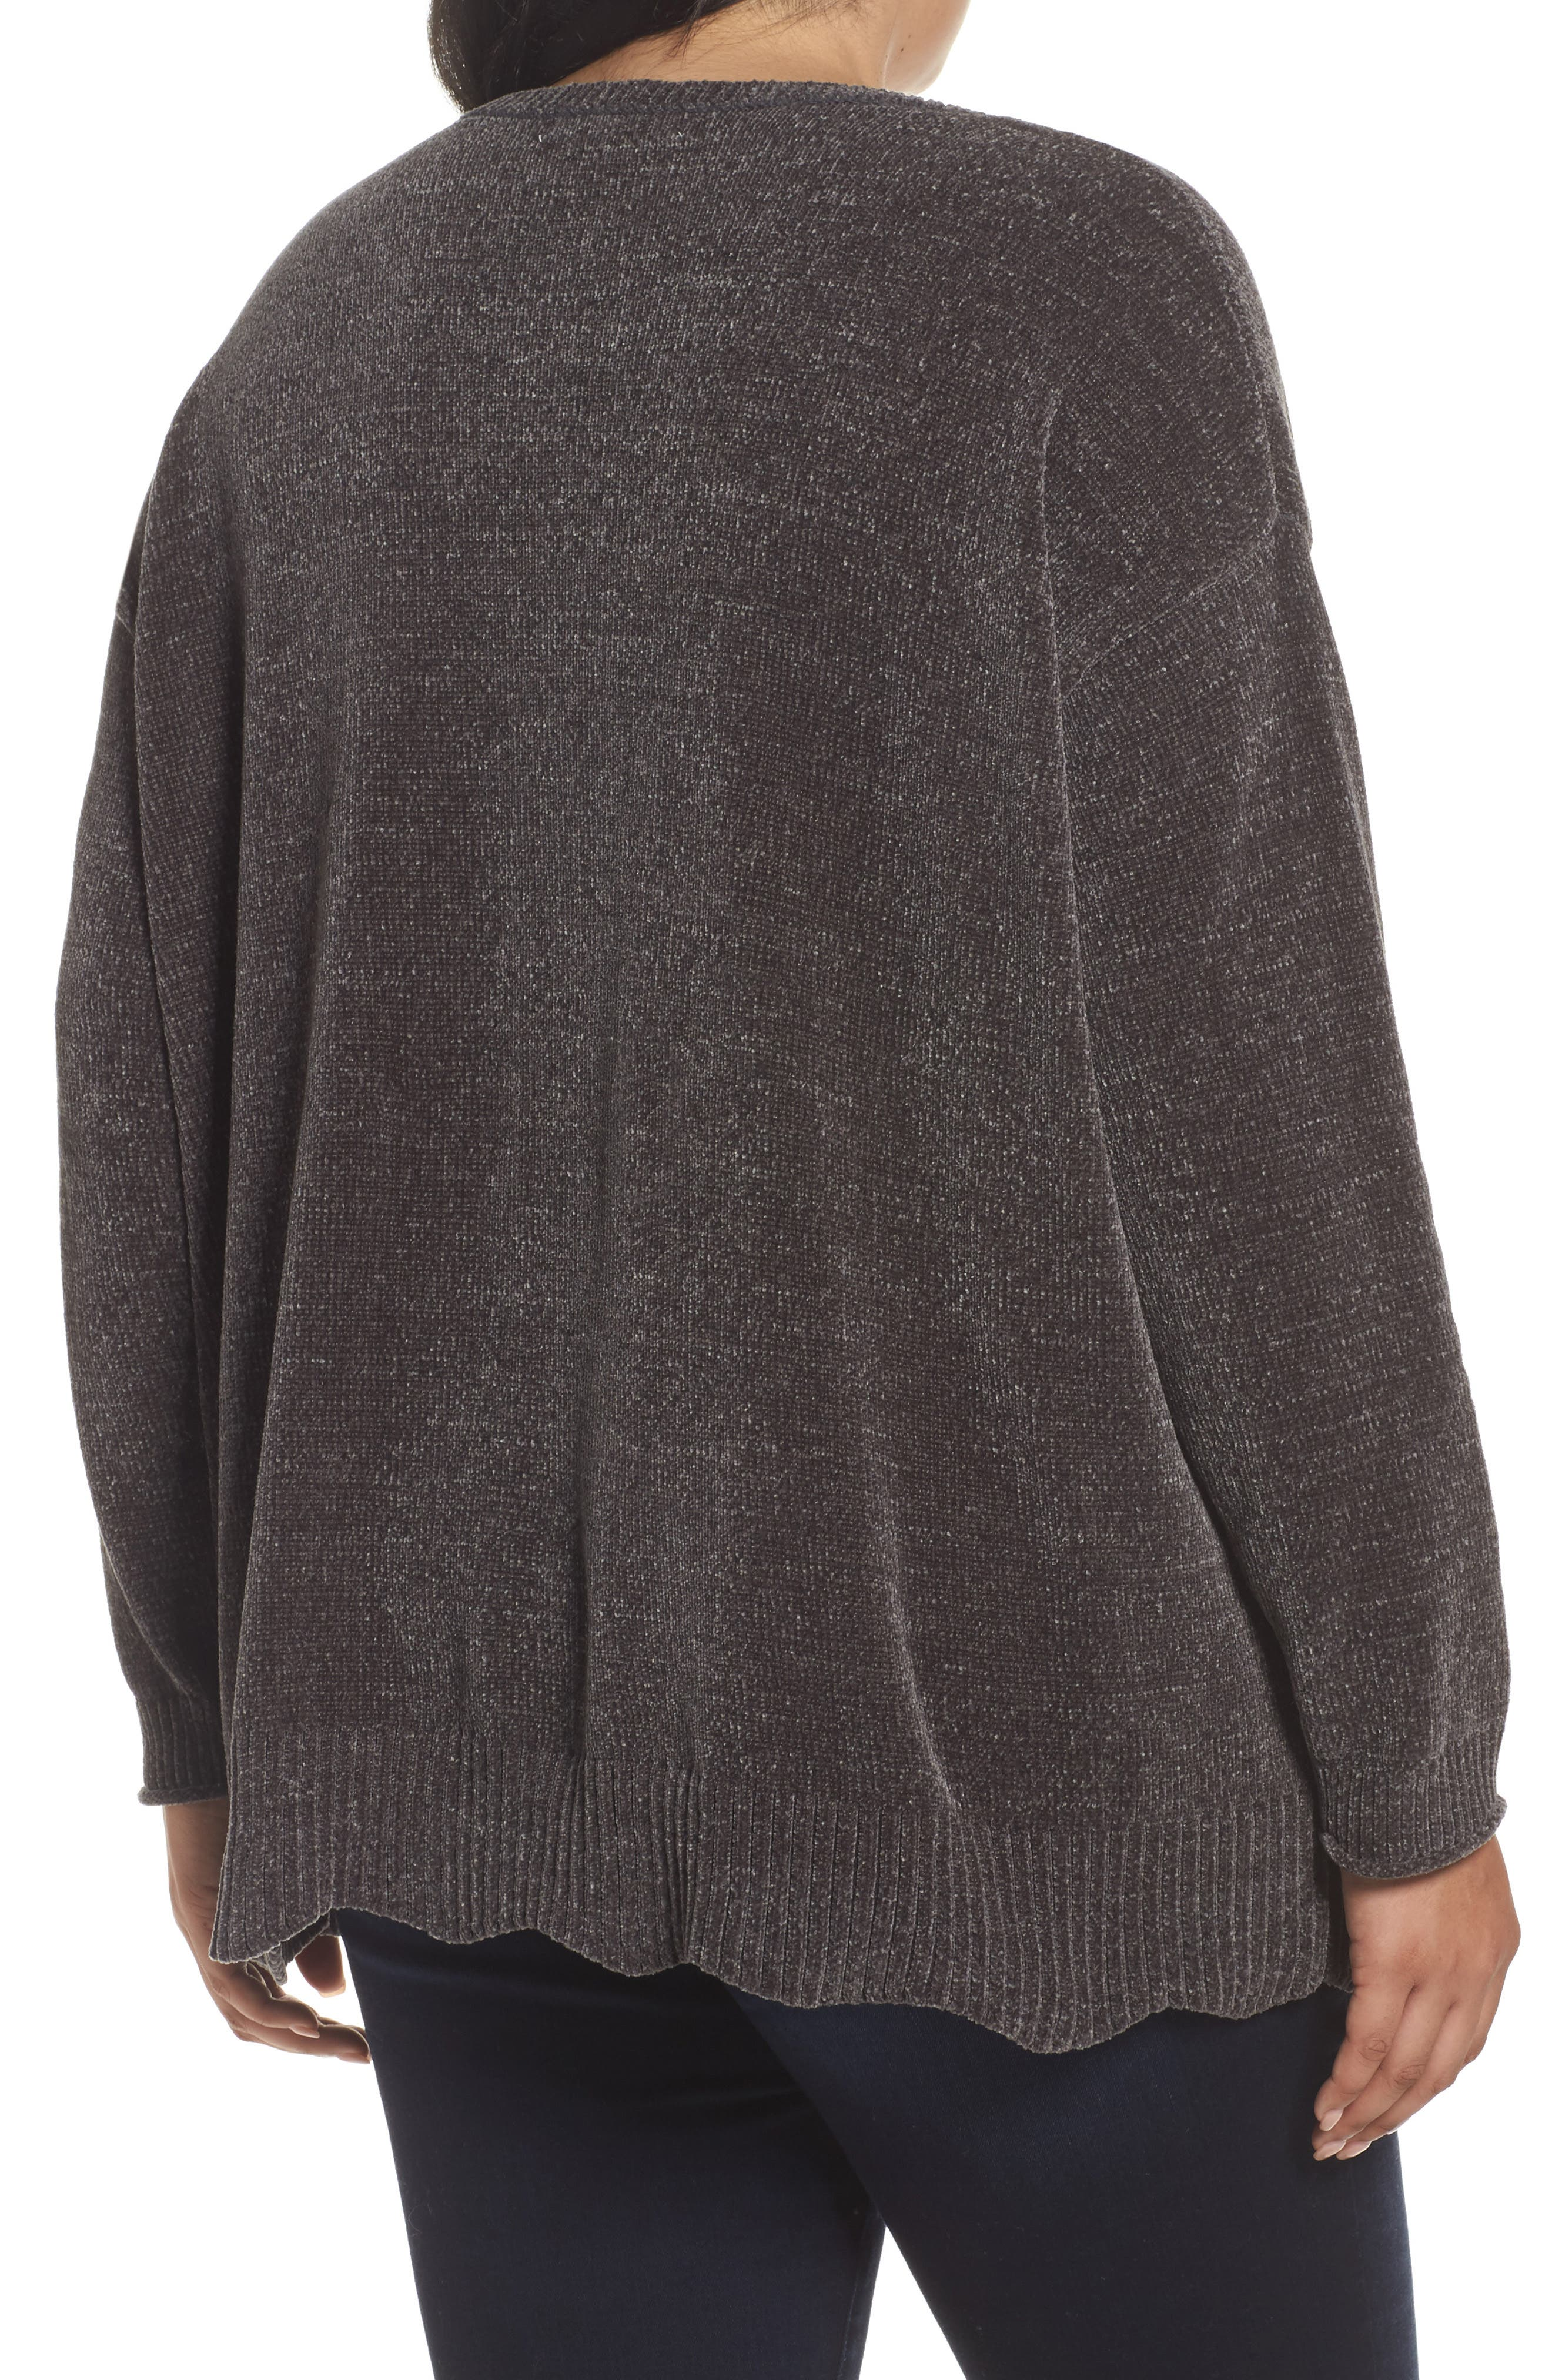 Scallop Hem Sweater,                             Alternate thumbnail 2, color,                             021